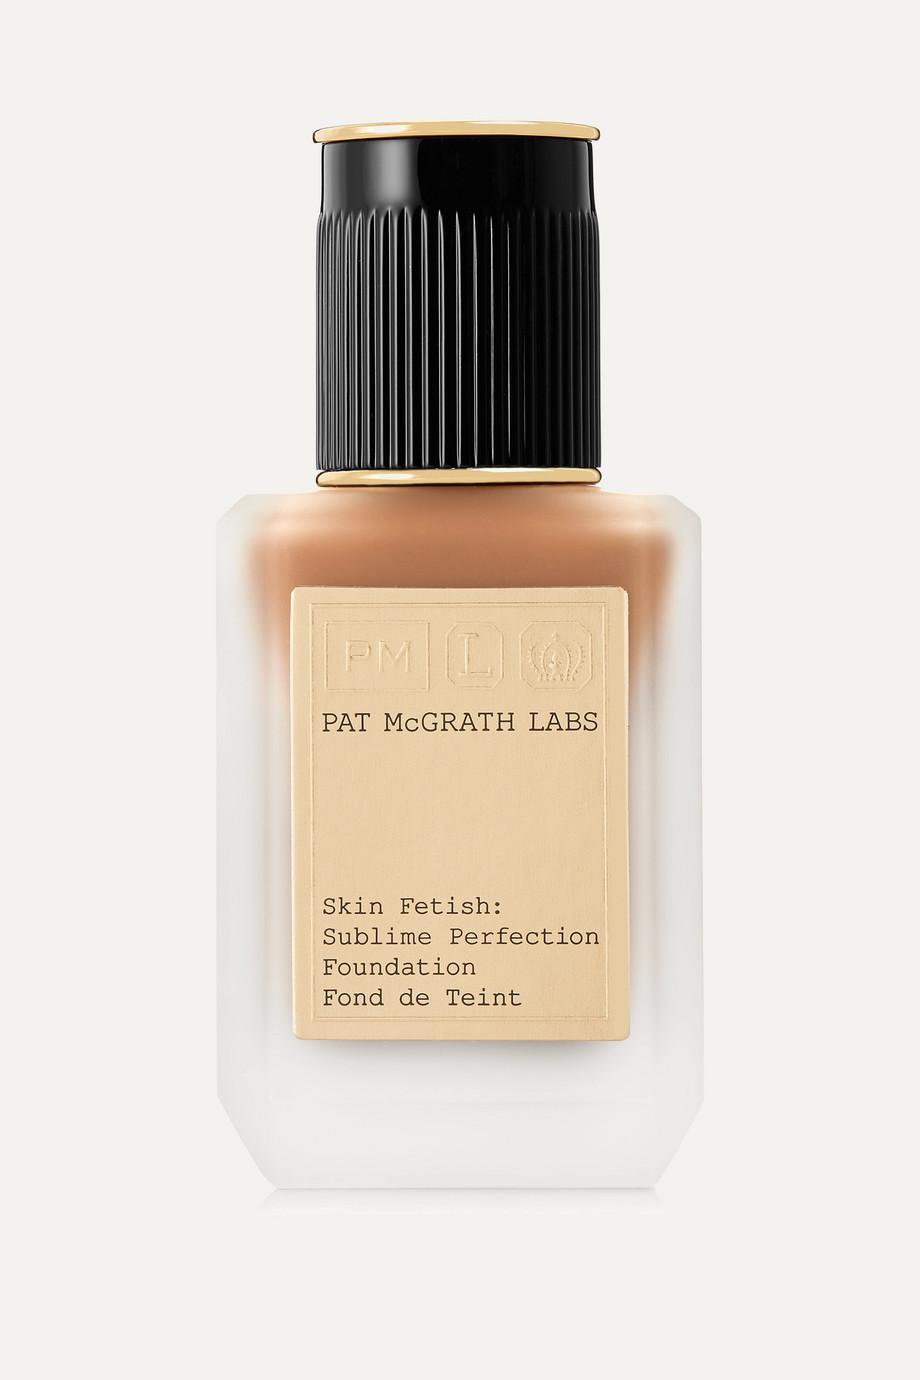 Pat McGrath Labs Skin Fetish: Sublime Perfection Foundation – Medium 21, 35 ml – Foundation